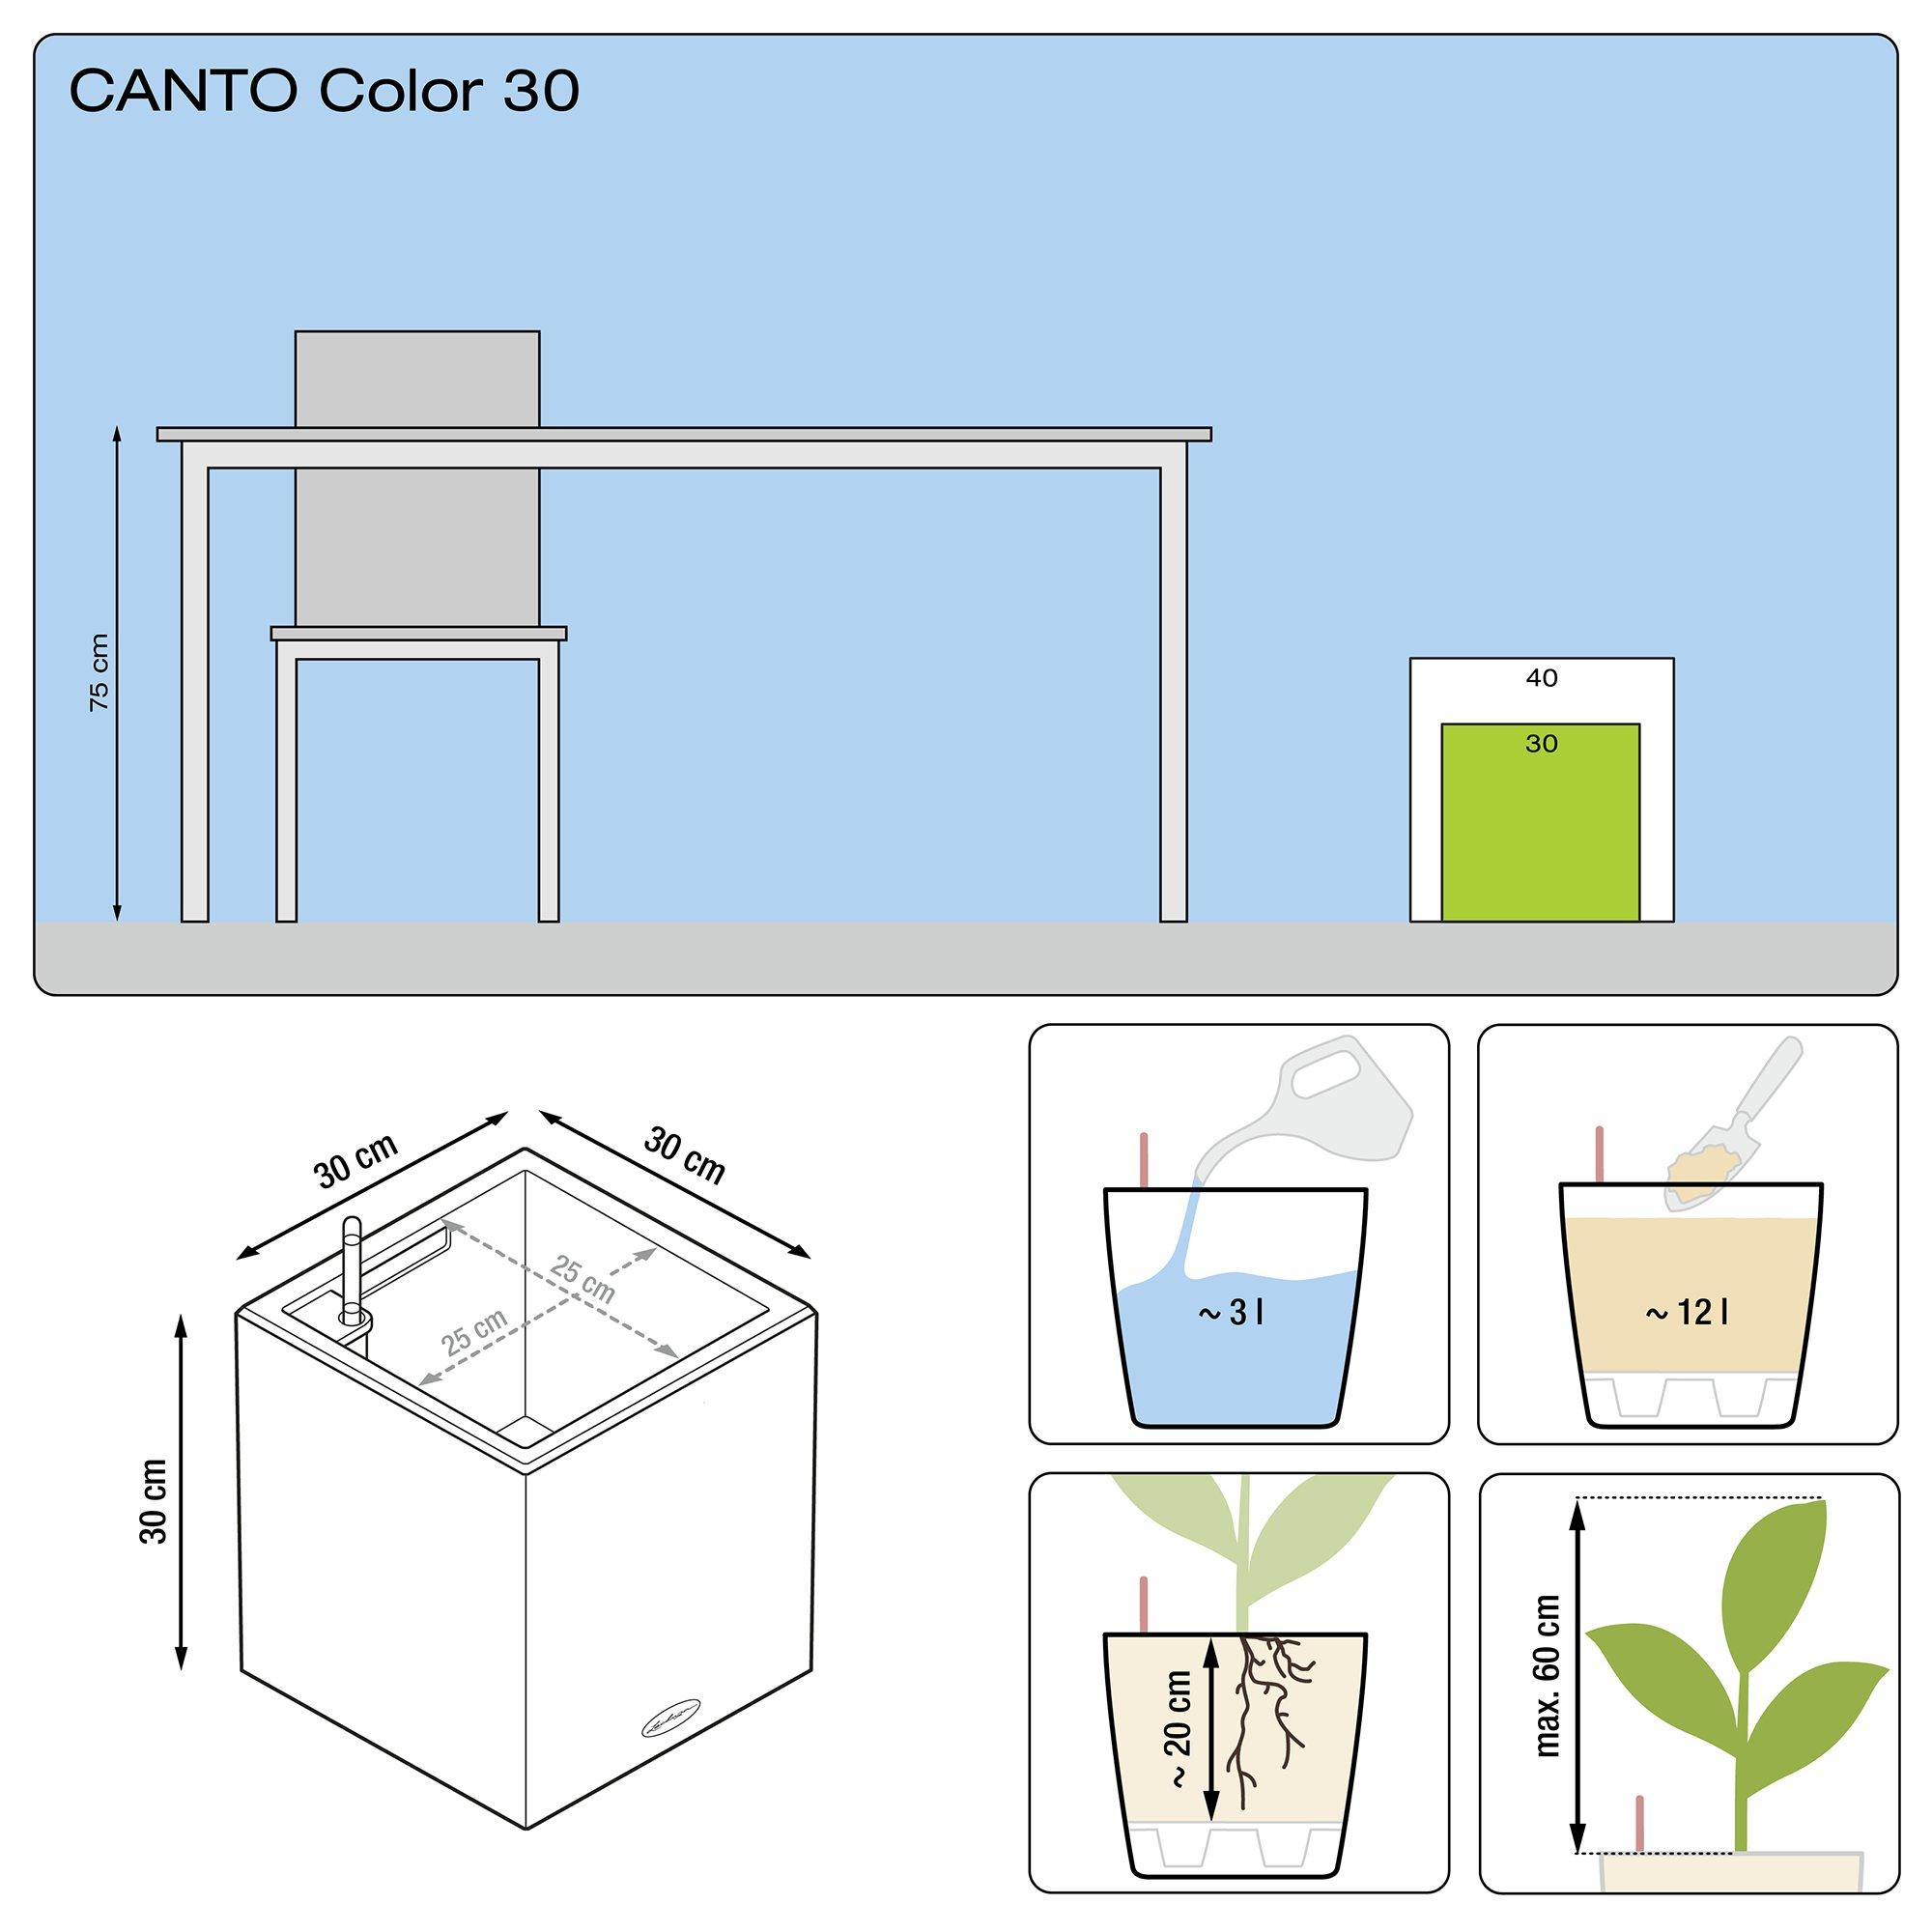 CANTO Color Würfel 30 graphitschwarz - Bild 3